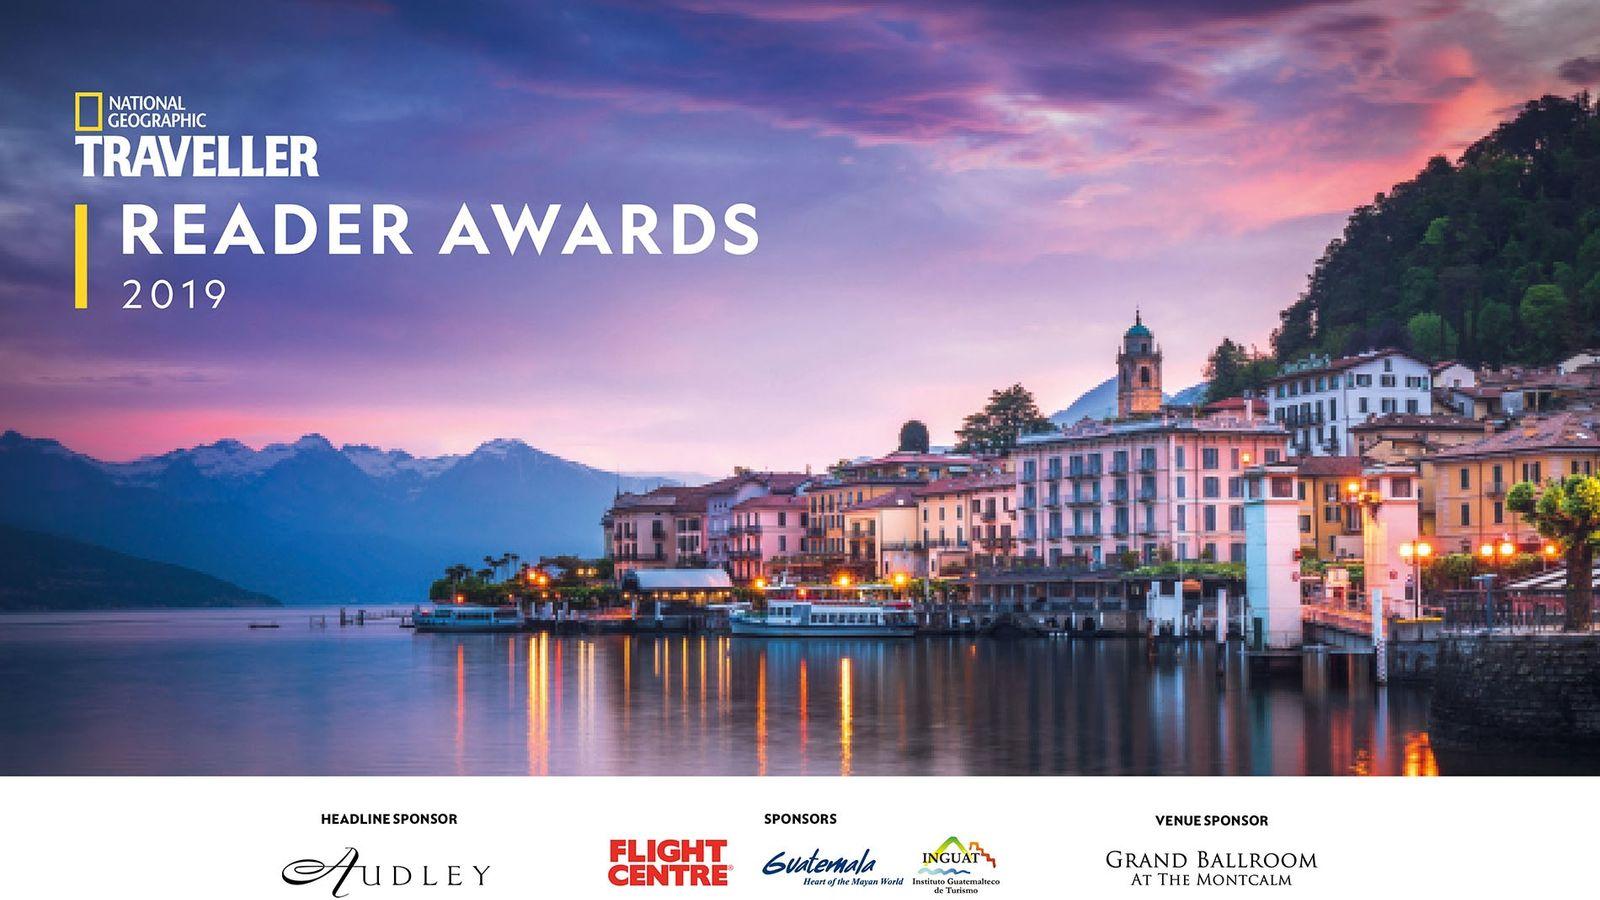 National Geographic Traveller Reader Awards 2019.